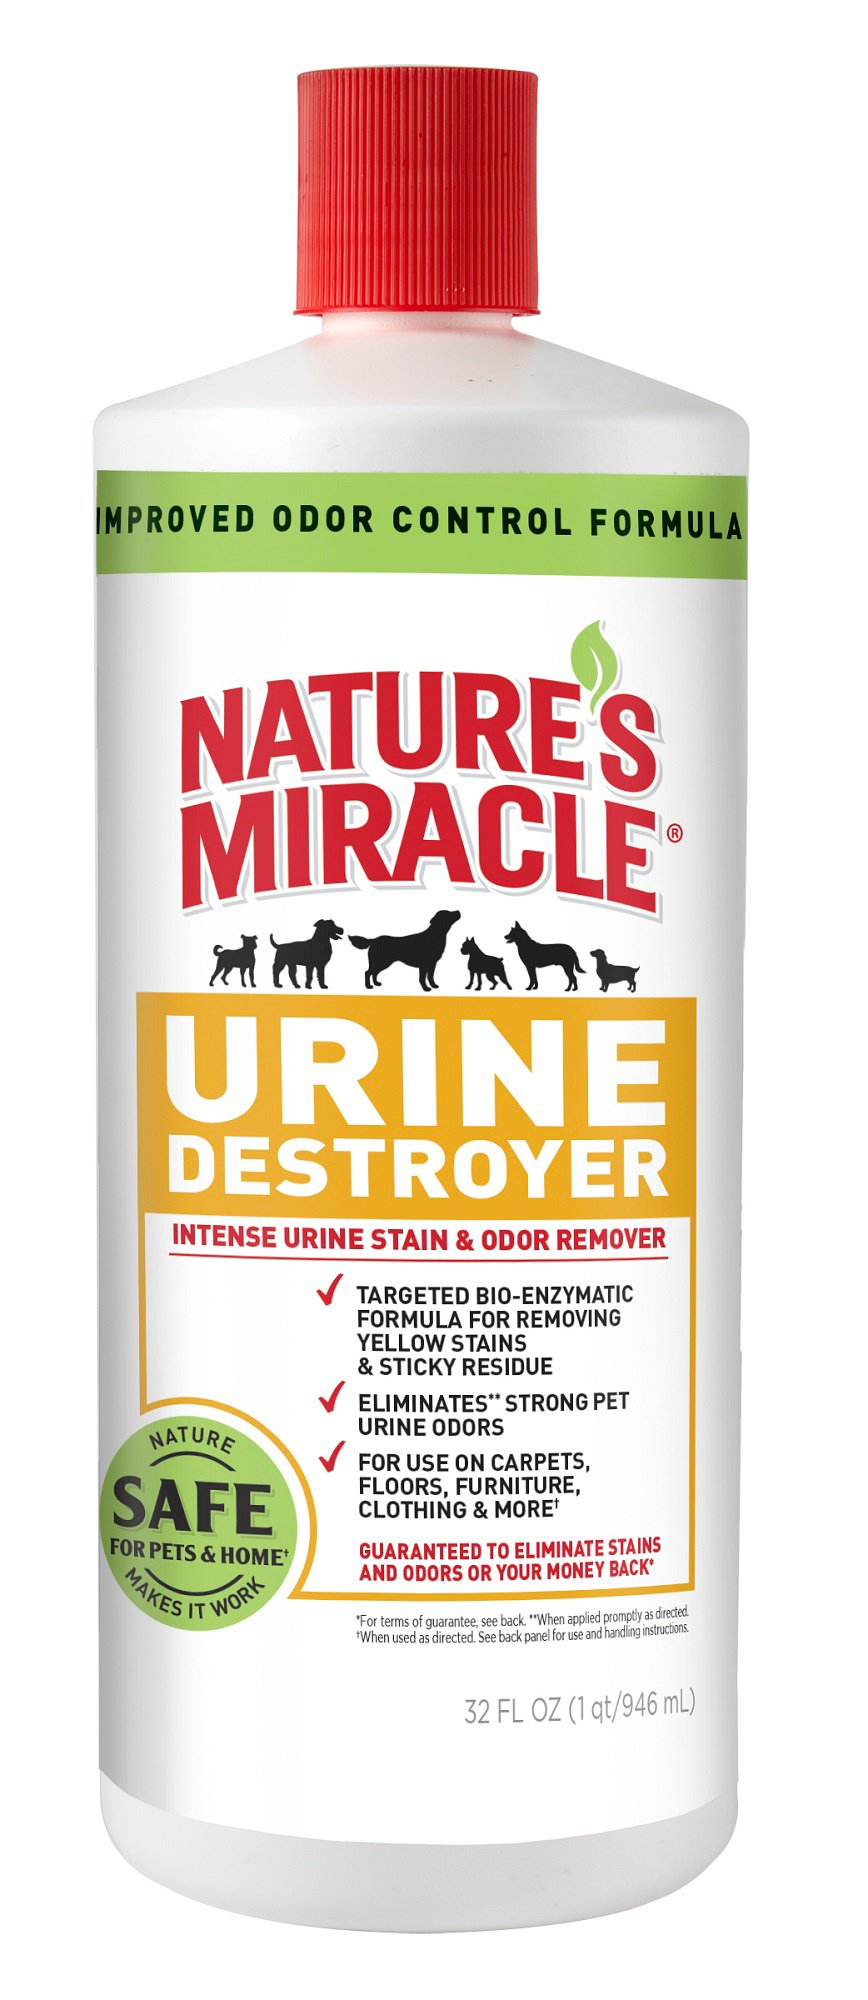 How To Get Human Urine Odor Out Of Carpet